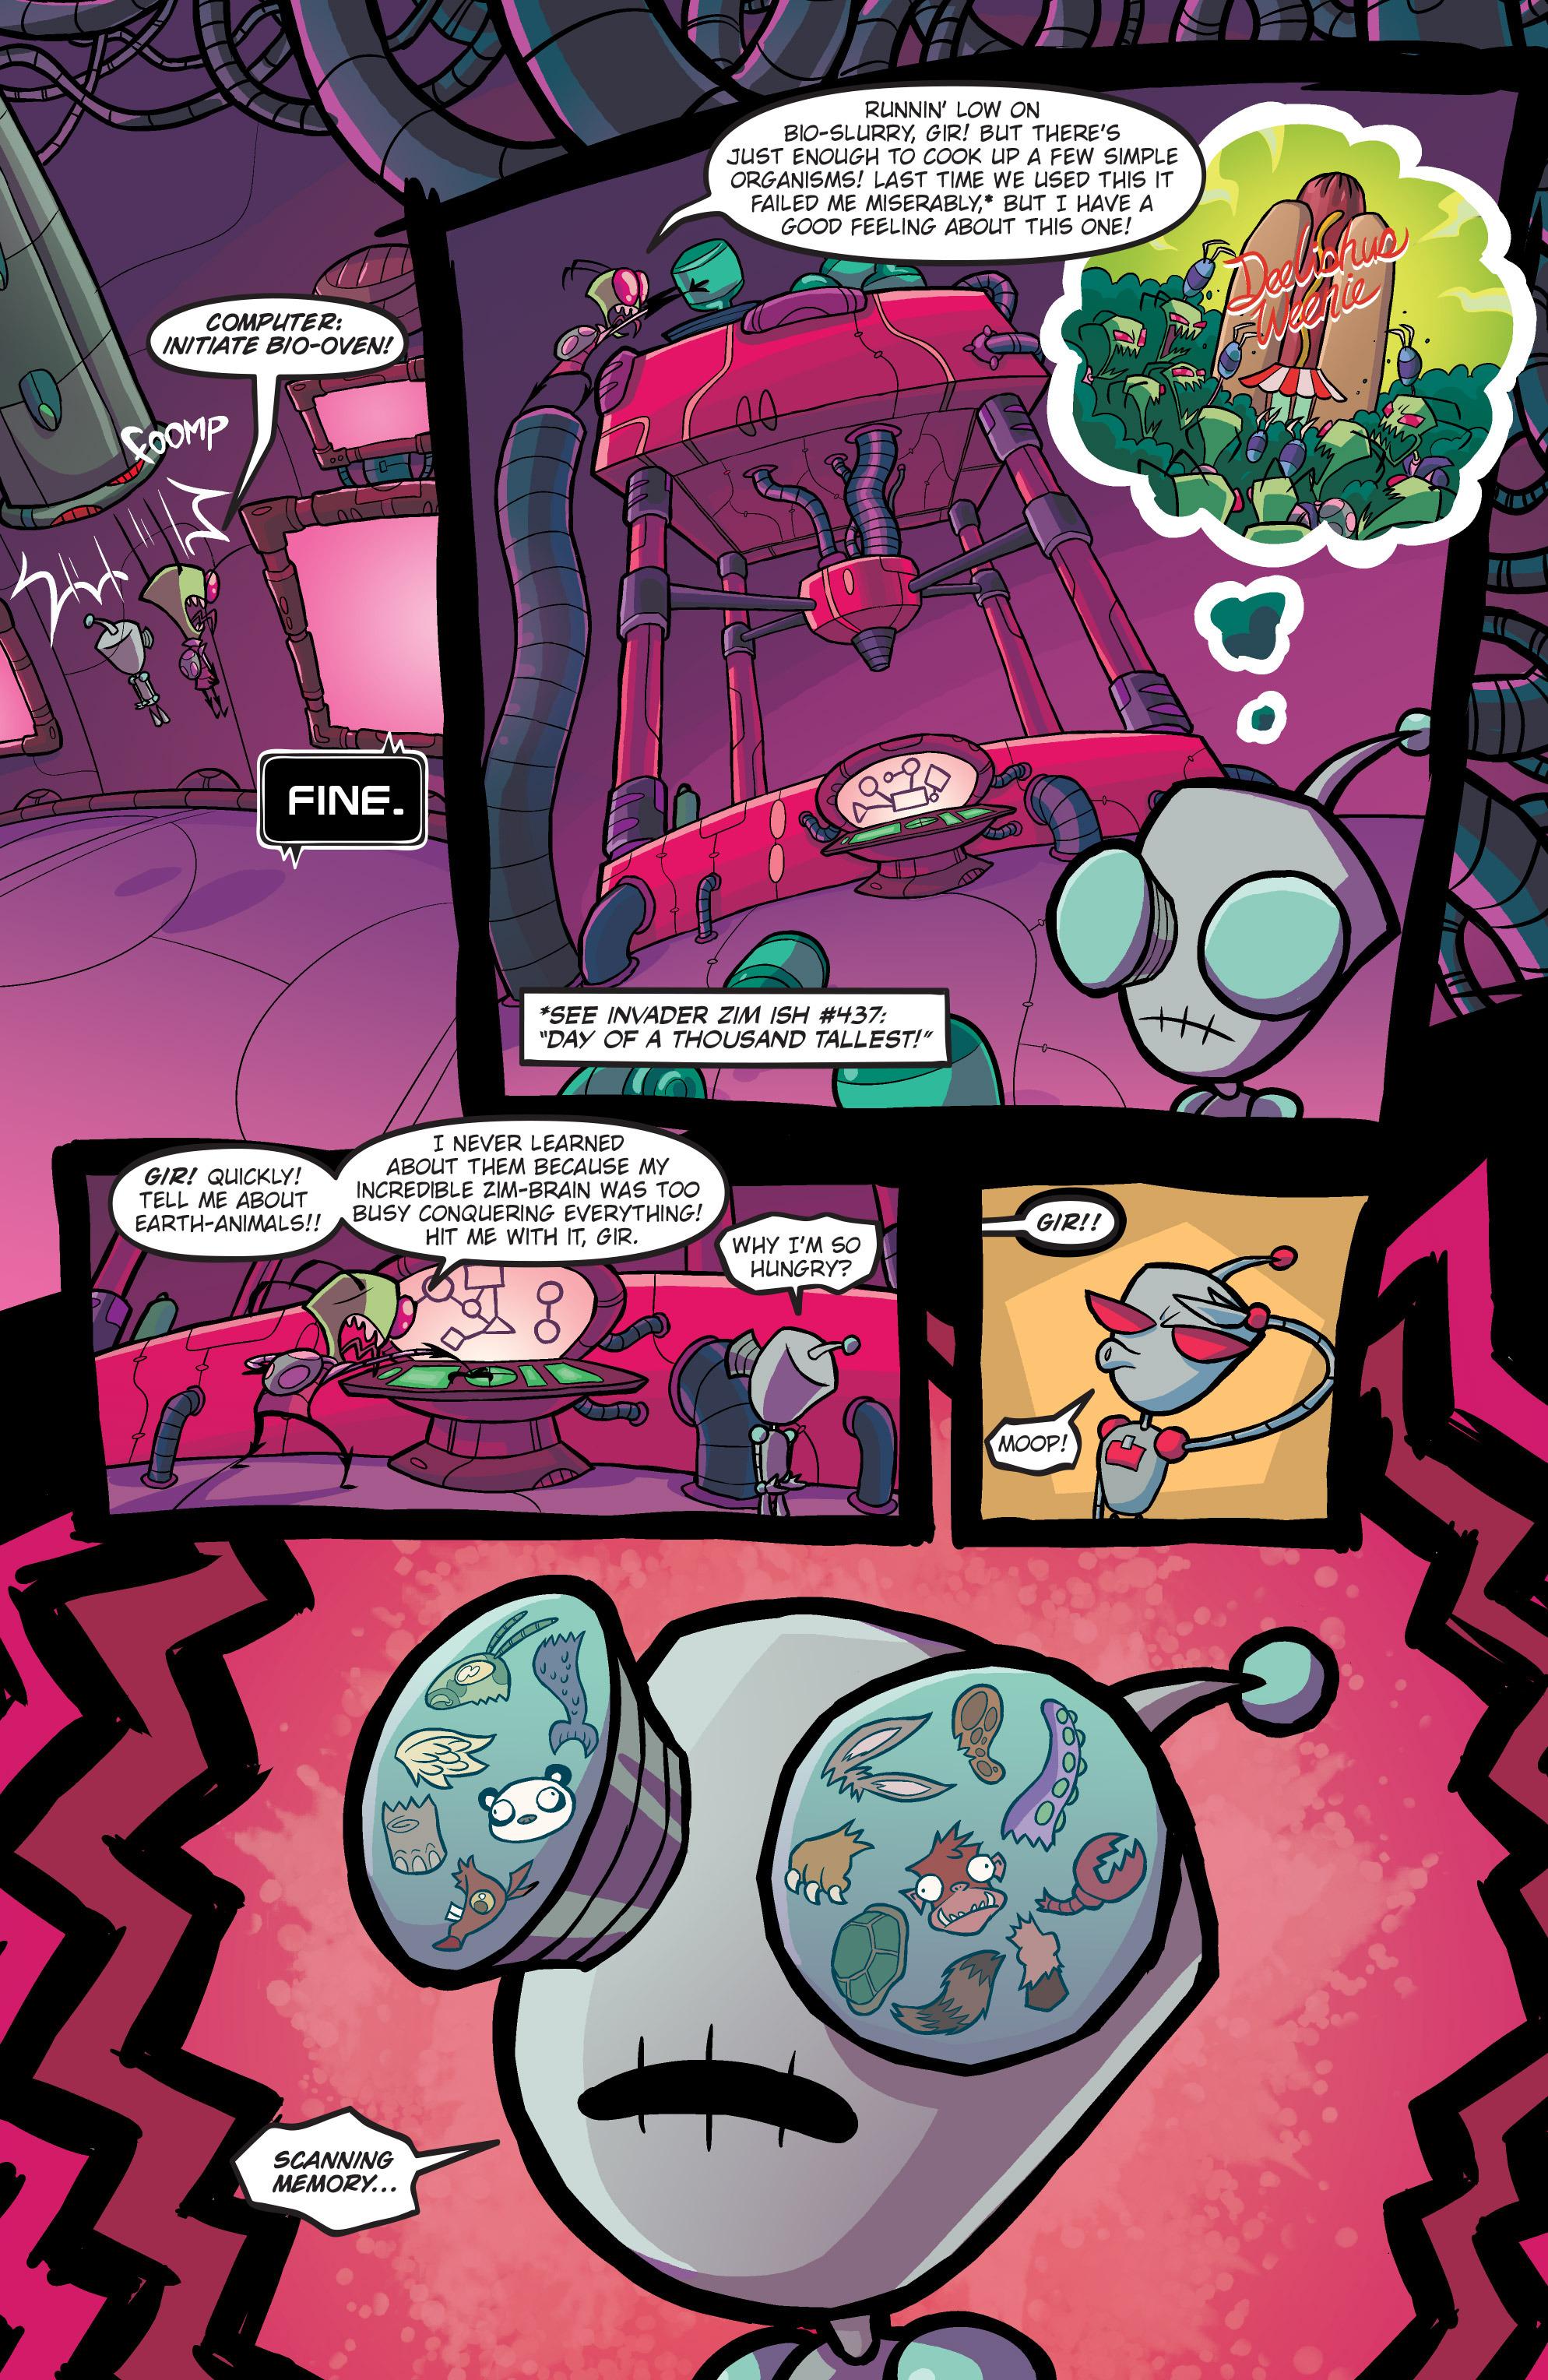 Read online Invader Zim comic -  Issue #19 - 7